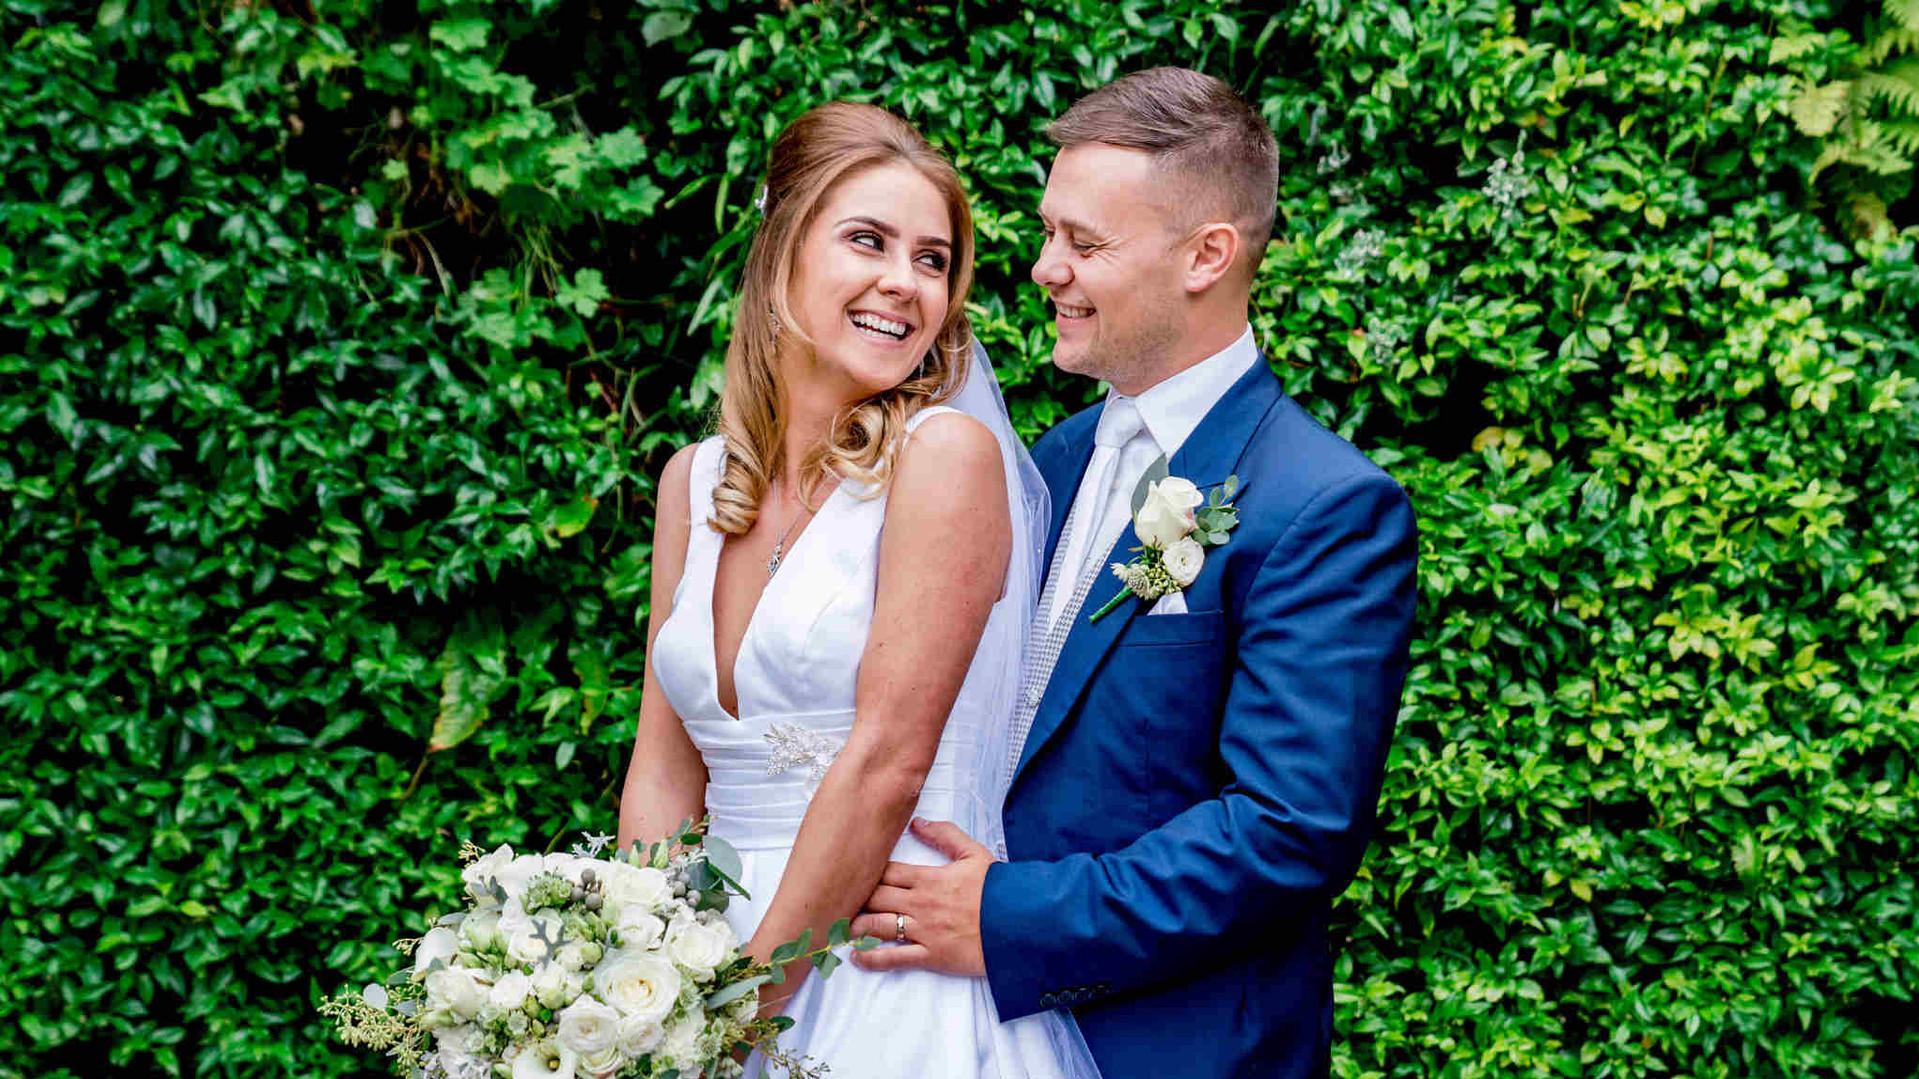 4.Laura & Dominik - Couple Shots-22_Easy